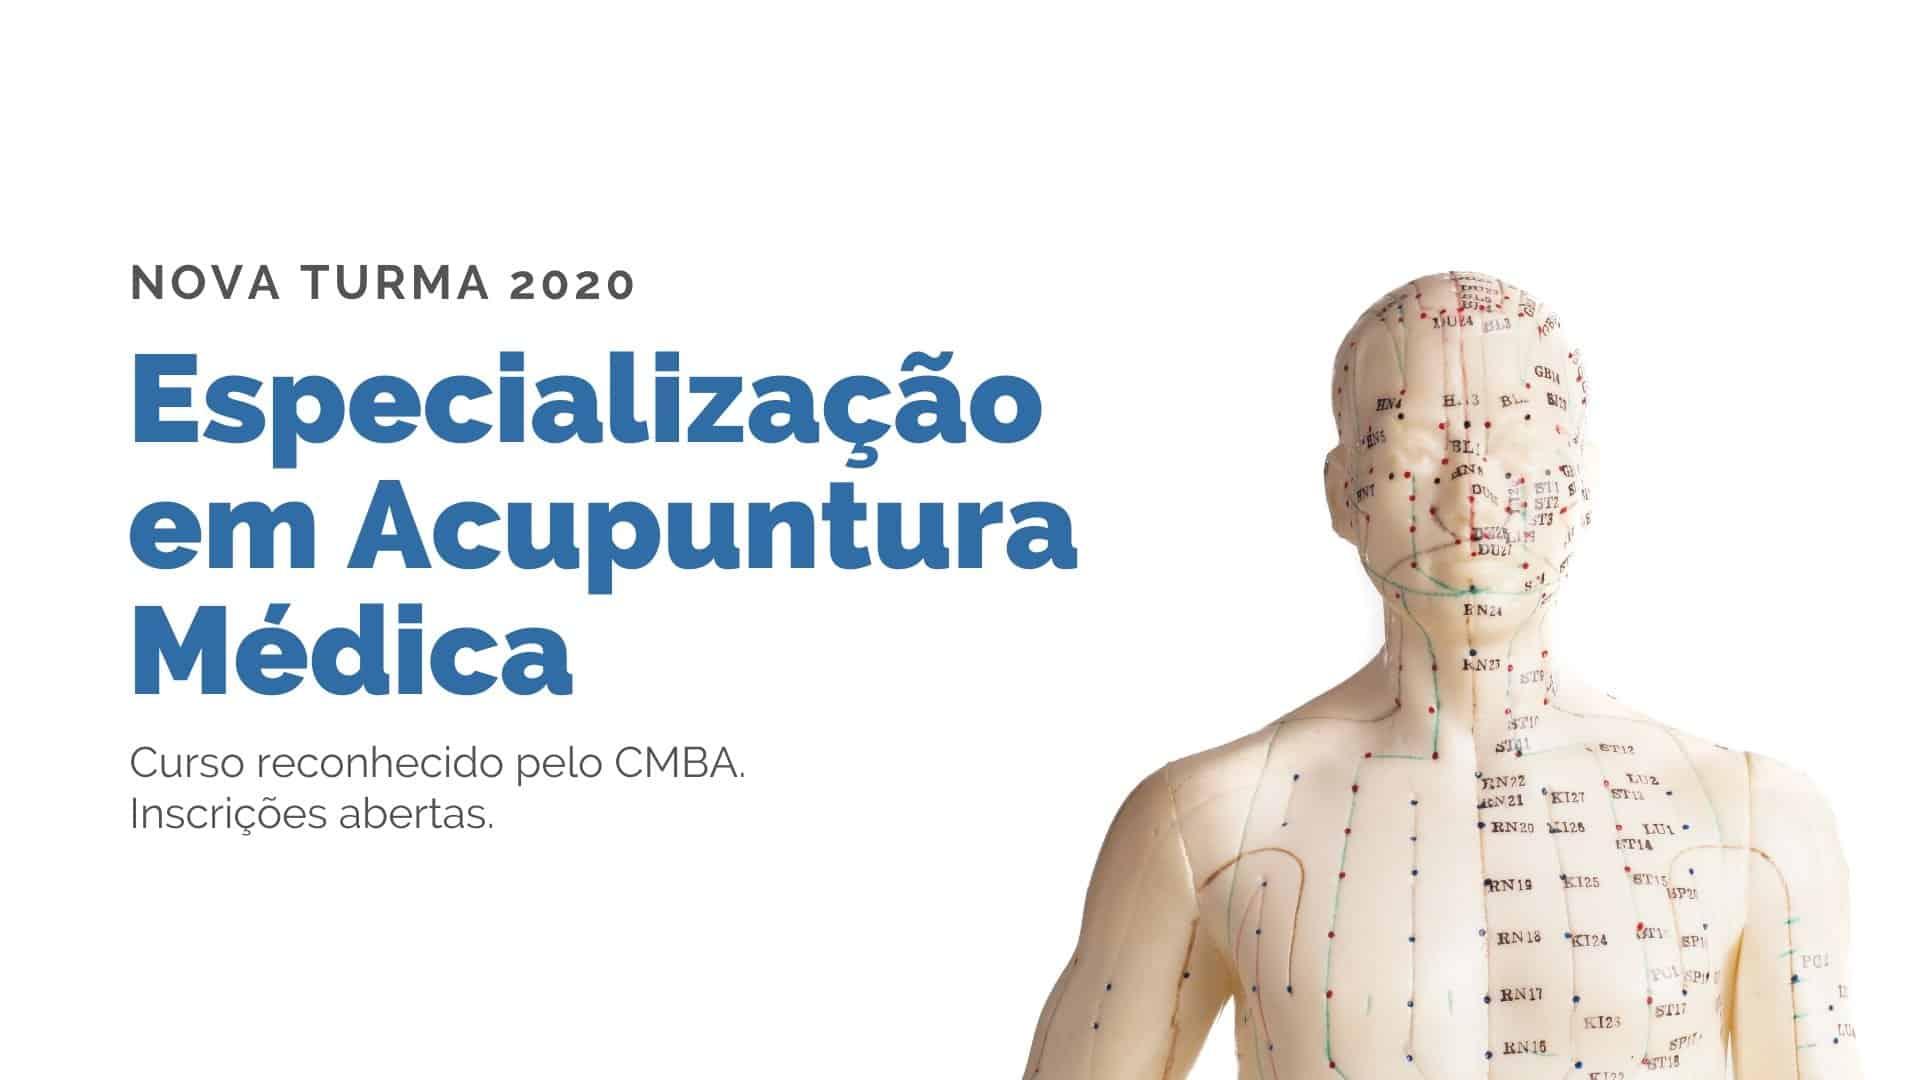 CEIMEC - CURSO DE ACUPUNTURA 2020